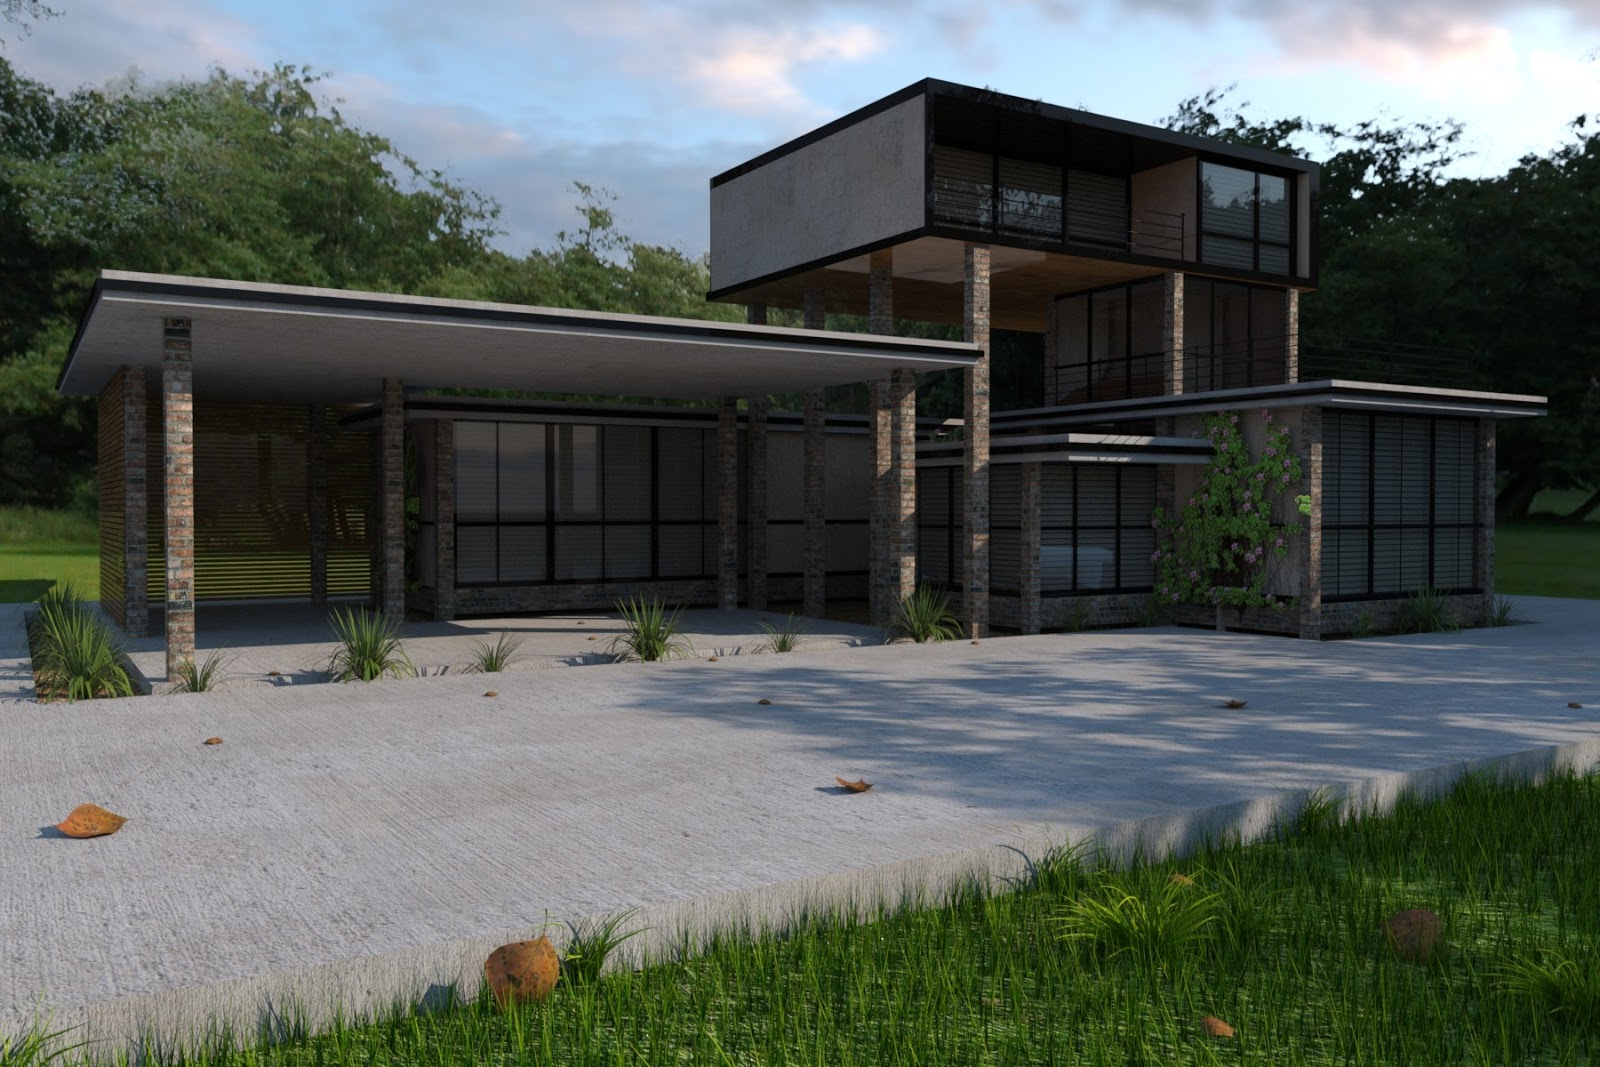 Download daz studio 3 for free daz 3d modular home builder for 3d home builder online free